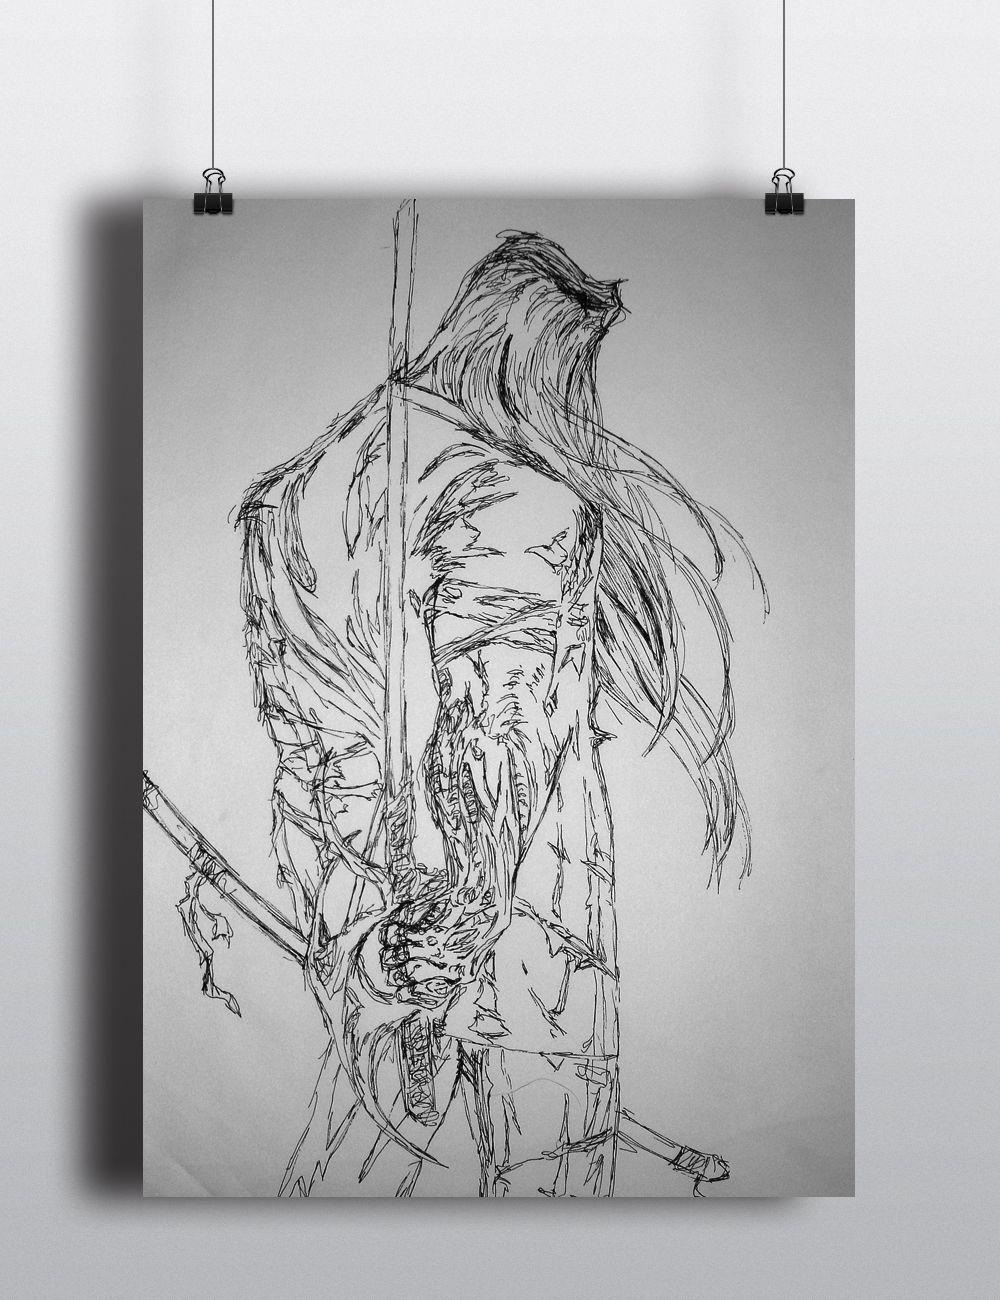 http://gl0uf.deviantart.com/art/Nottingham-I-Witchblade-566883407